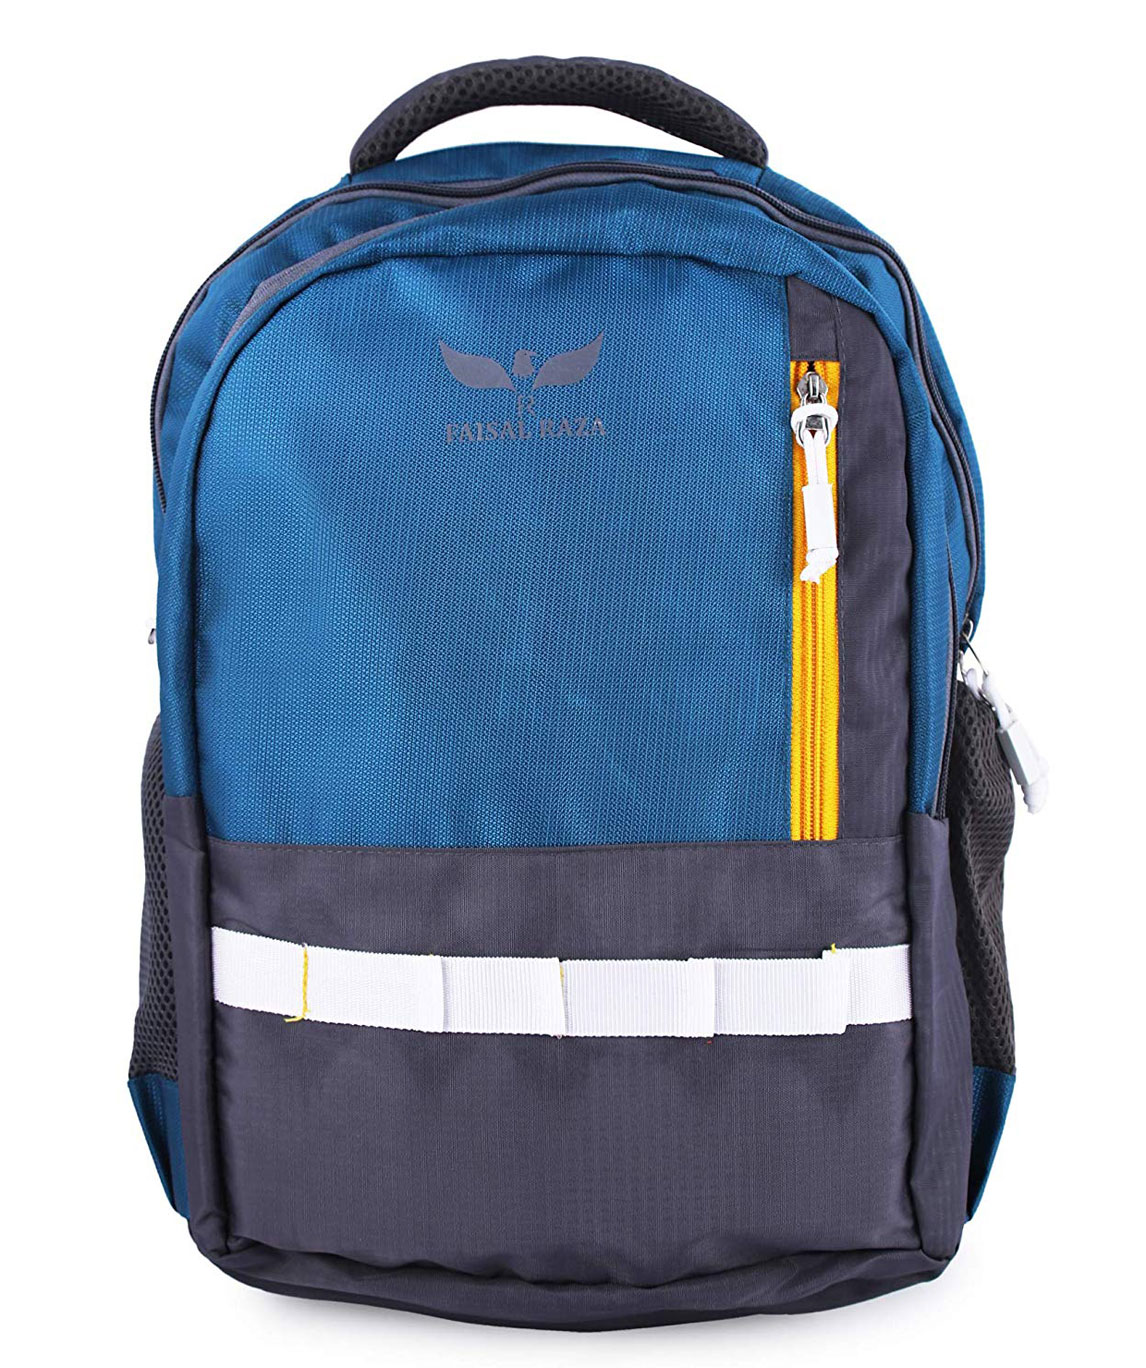 Frista30 Liters Casual Bagpack/School Bag/Laptop Backpack(Multi)